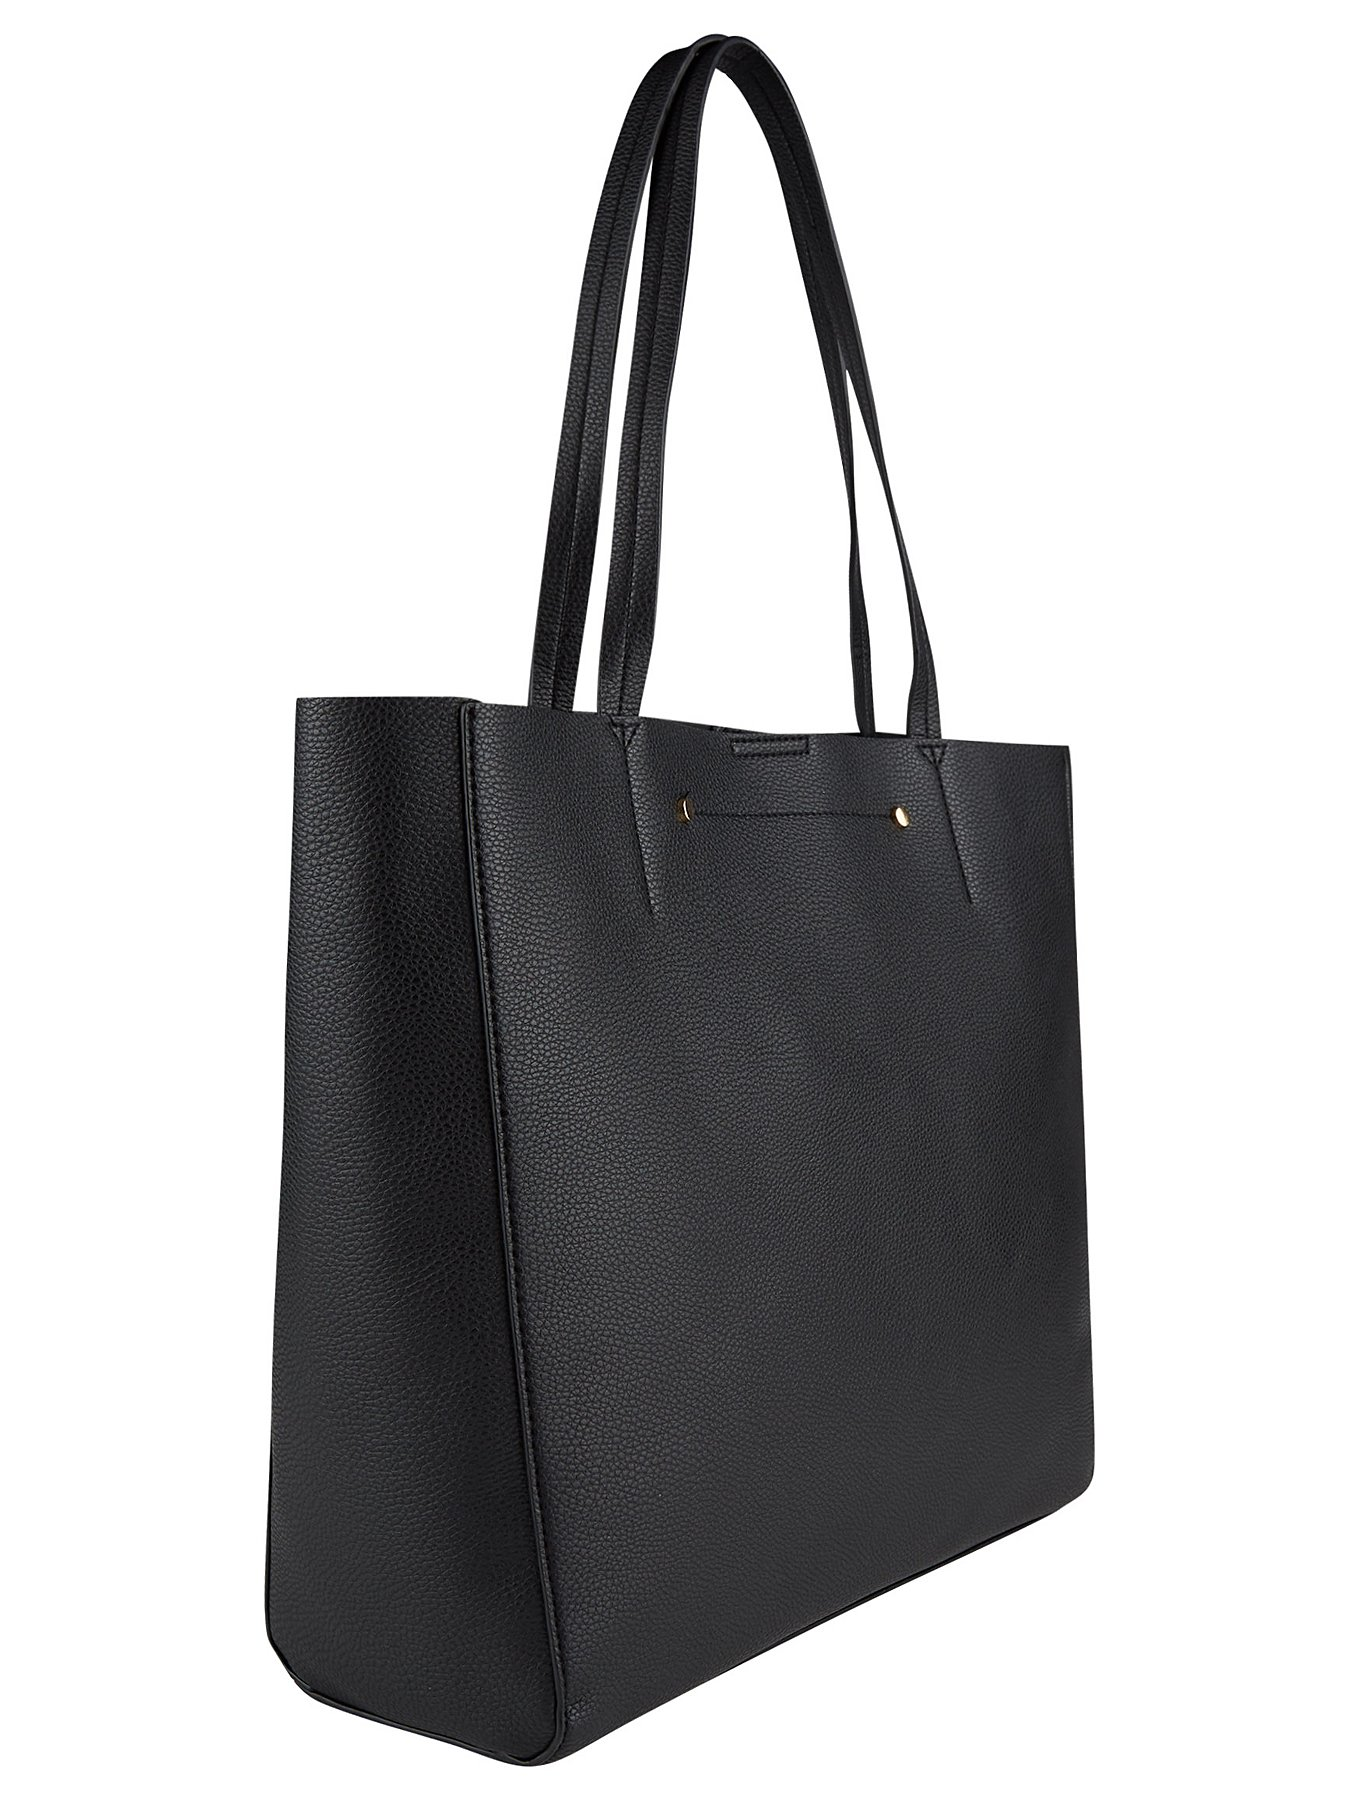 Black Double Stud Tote Bag